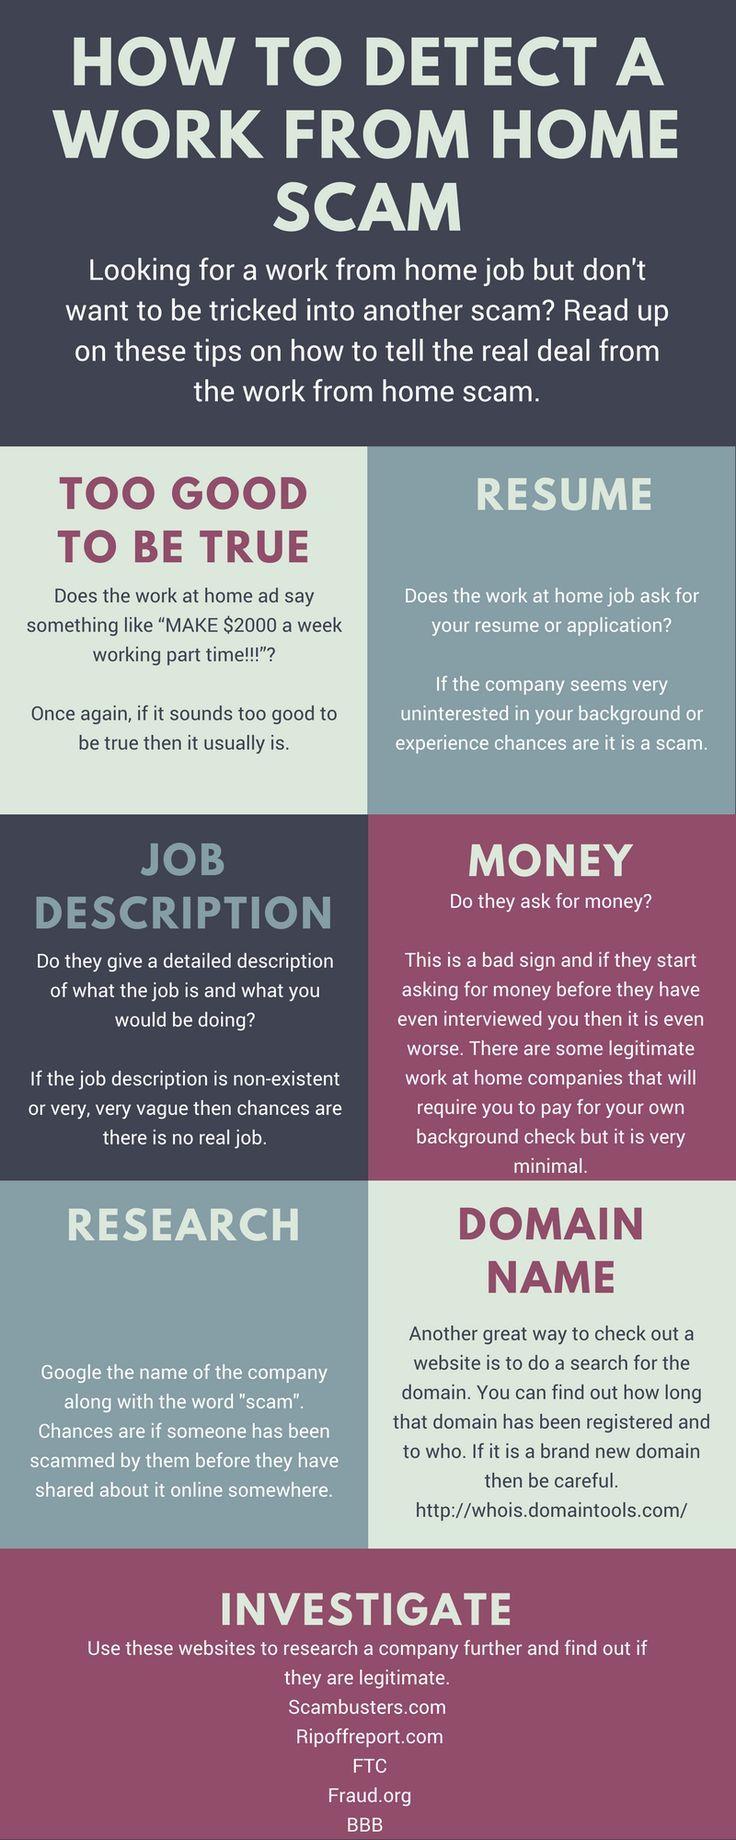 Best 25 company job ideas on pinterest starting a company business to business and start up business